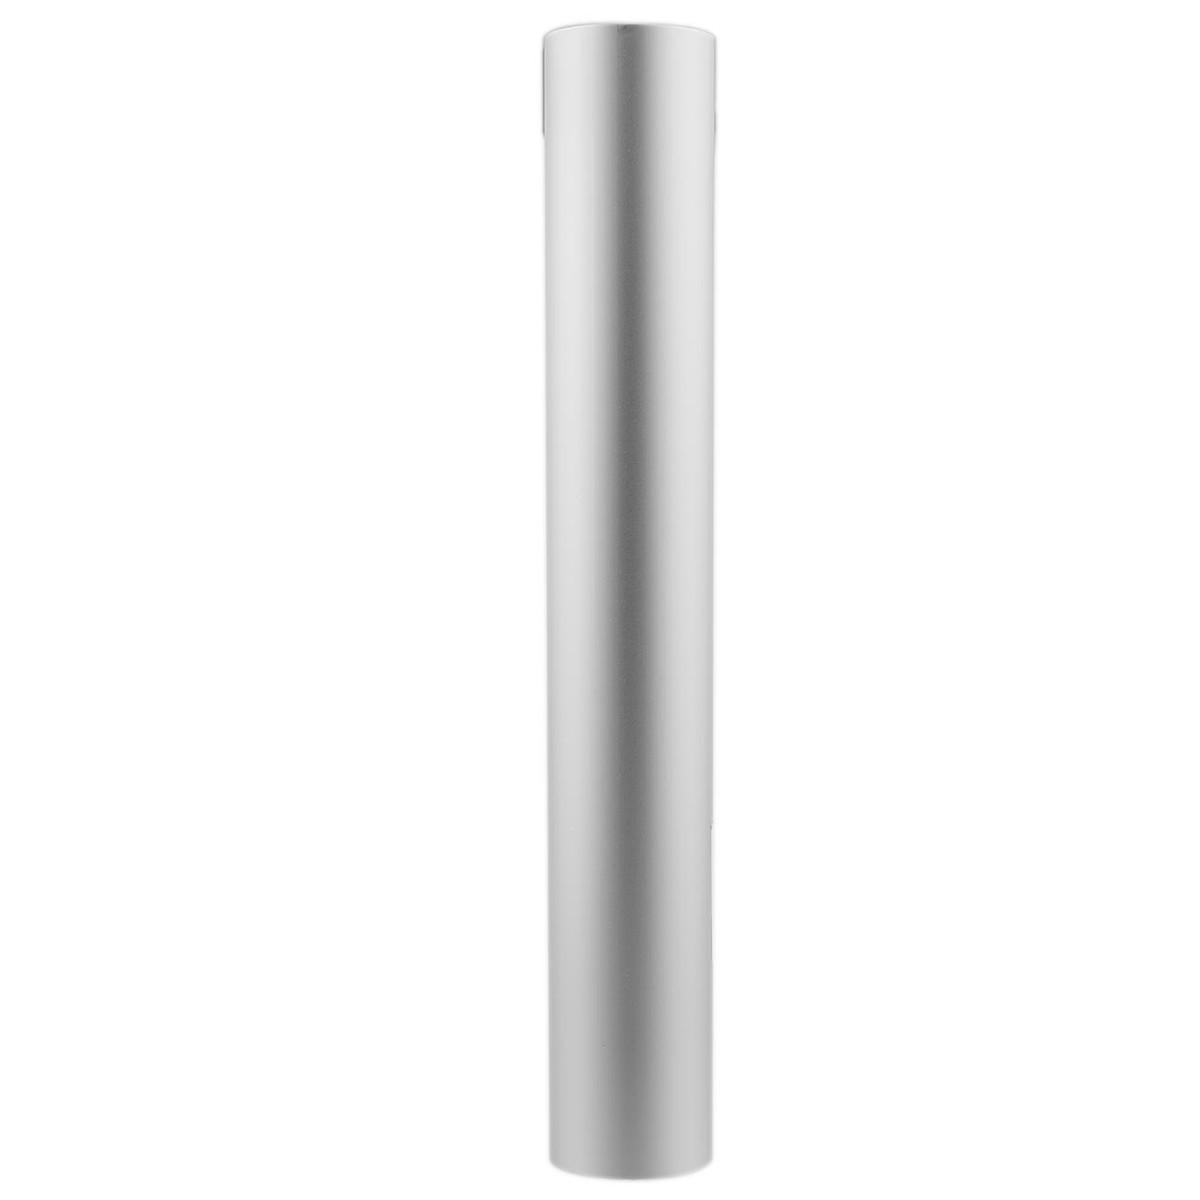 Bolton Tech Bolton Technical 10 Inch Pole Mount Accessory for Outside Antenna